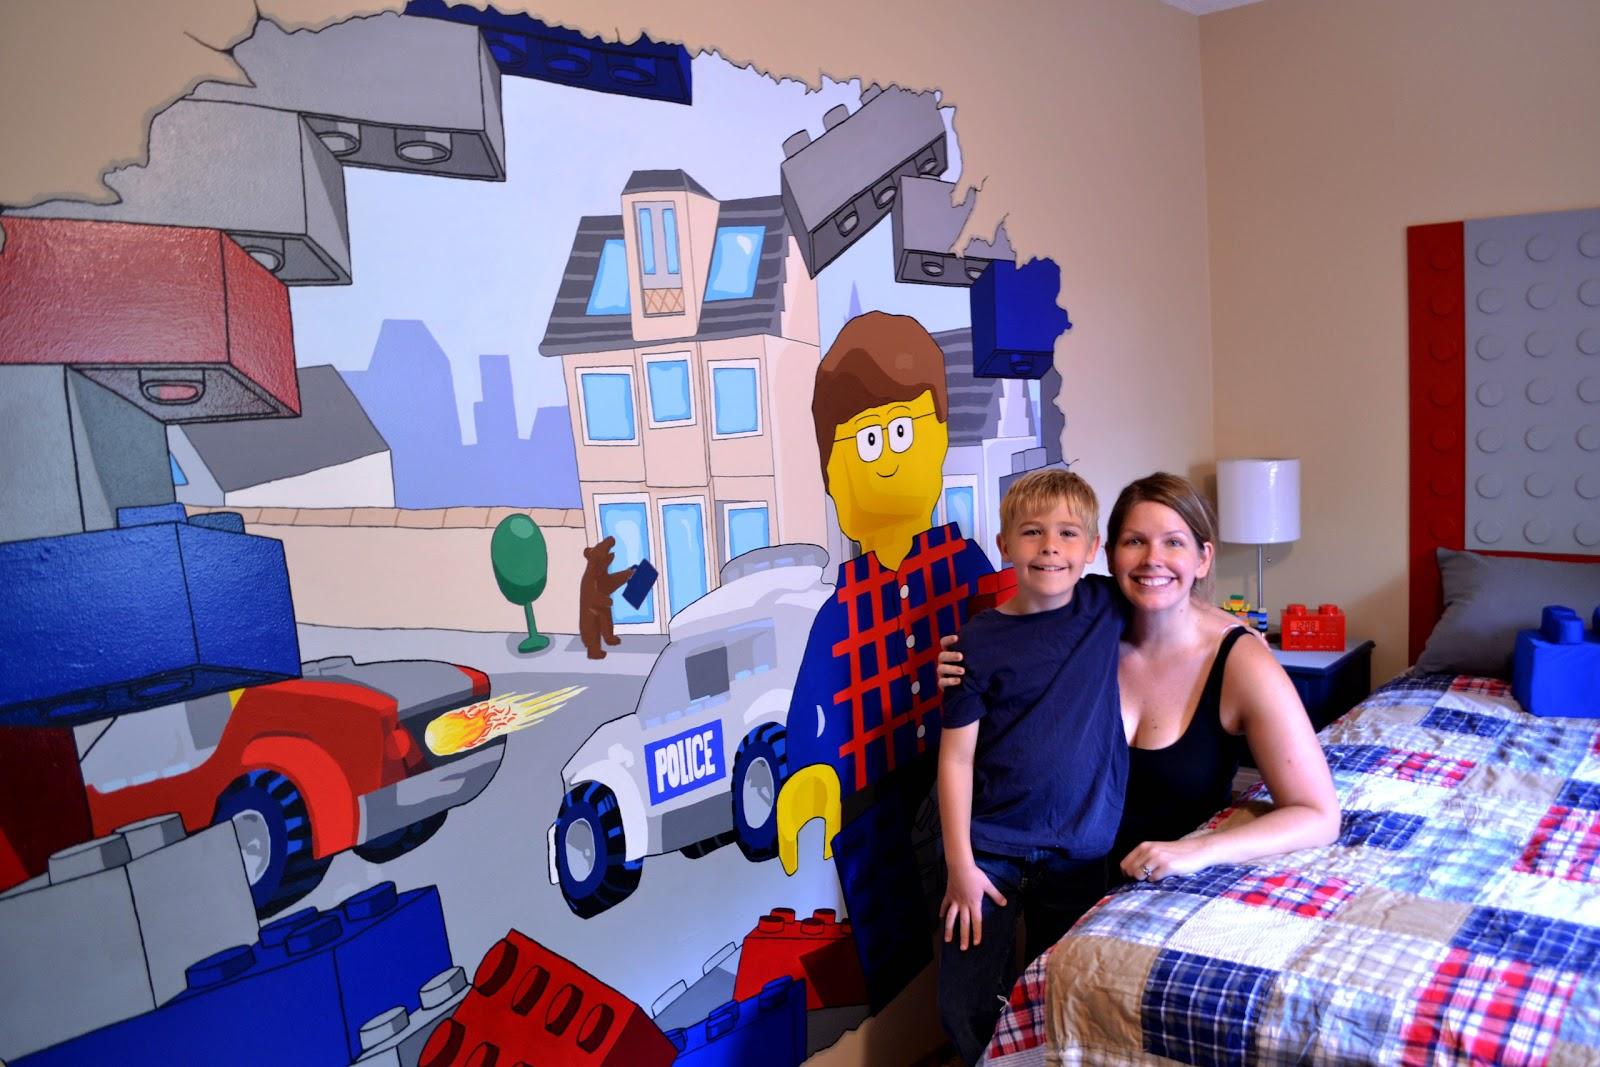 heidi schatze: LEGO Vaughn: Red Bright and Blue